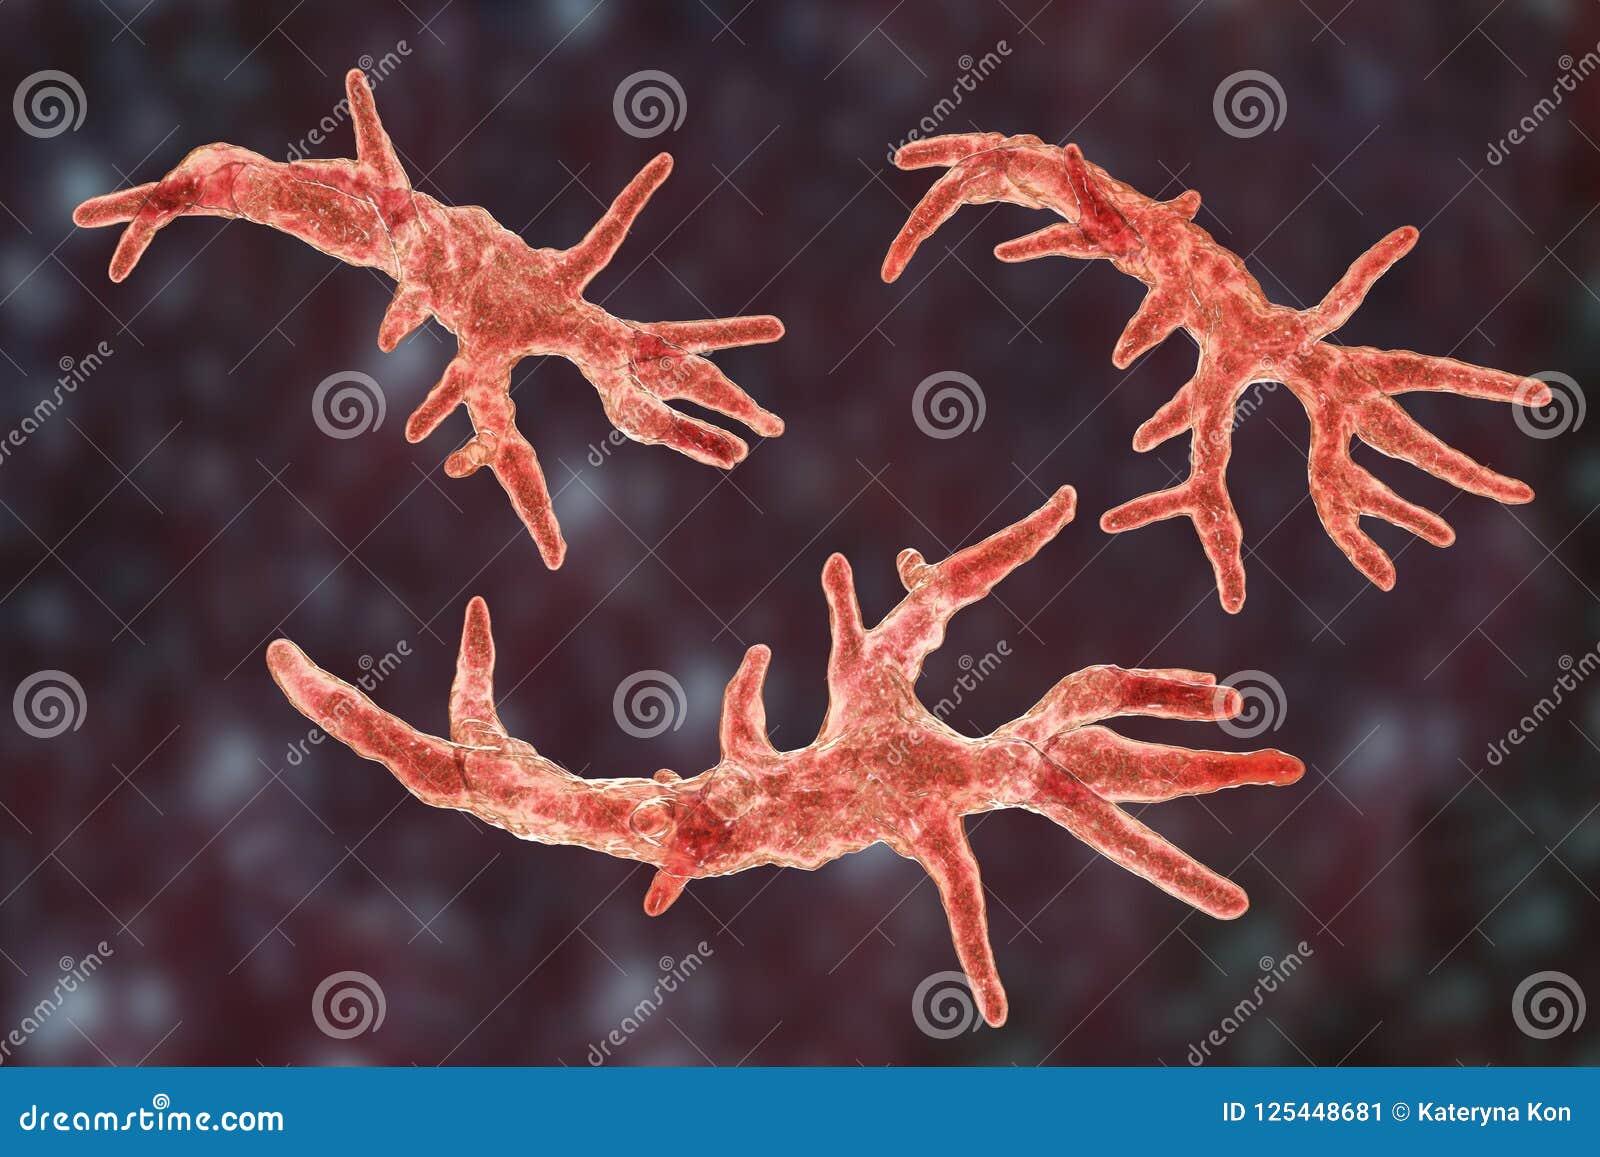 balamuthia mandrillaris amoeba stock illustration illustration of